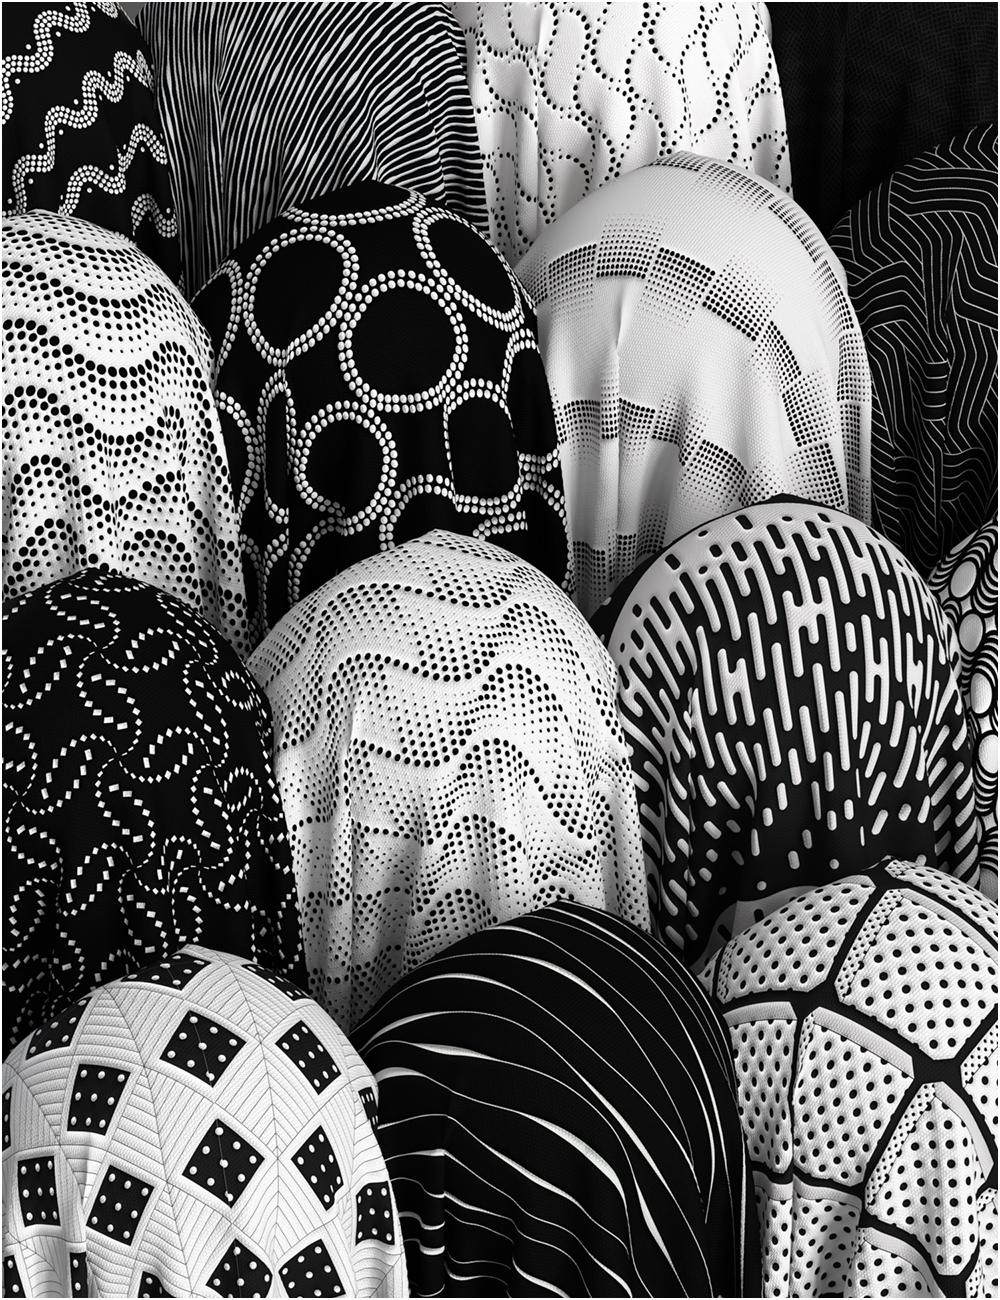 Monochrome Iray Shaders 01 - Merchant Resource by: OziChickhotlilme74, 3D Models by Daz 3D